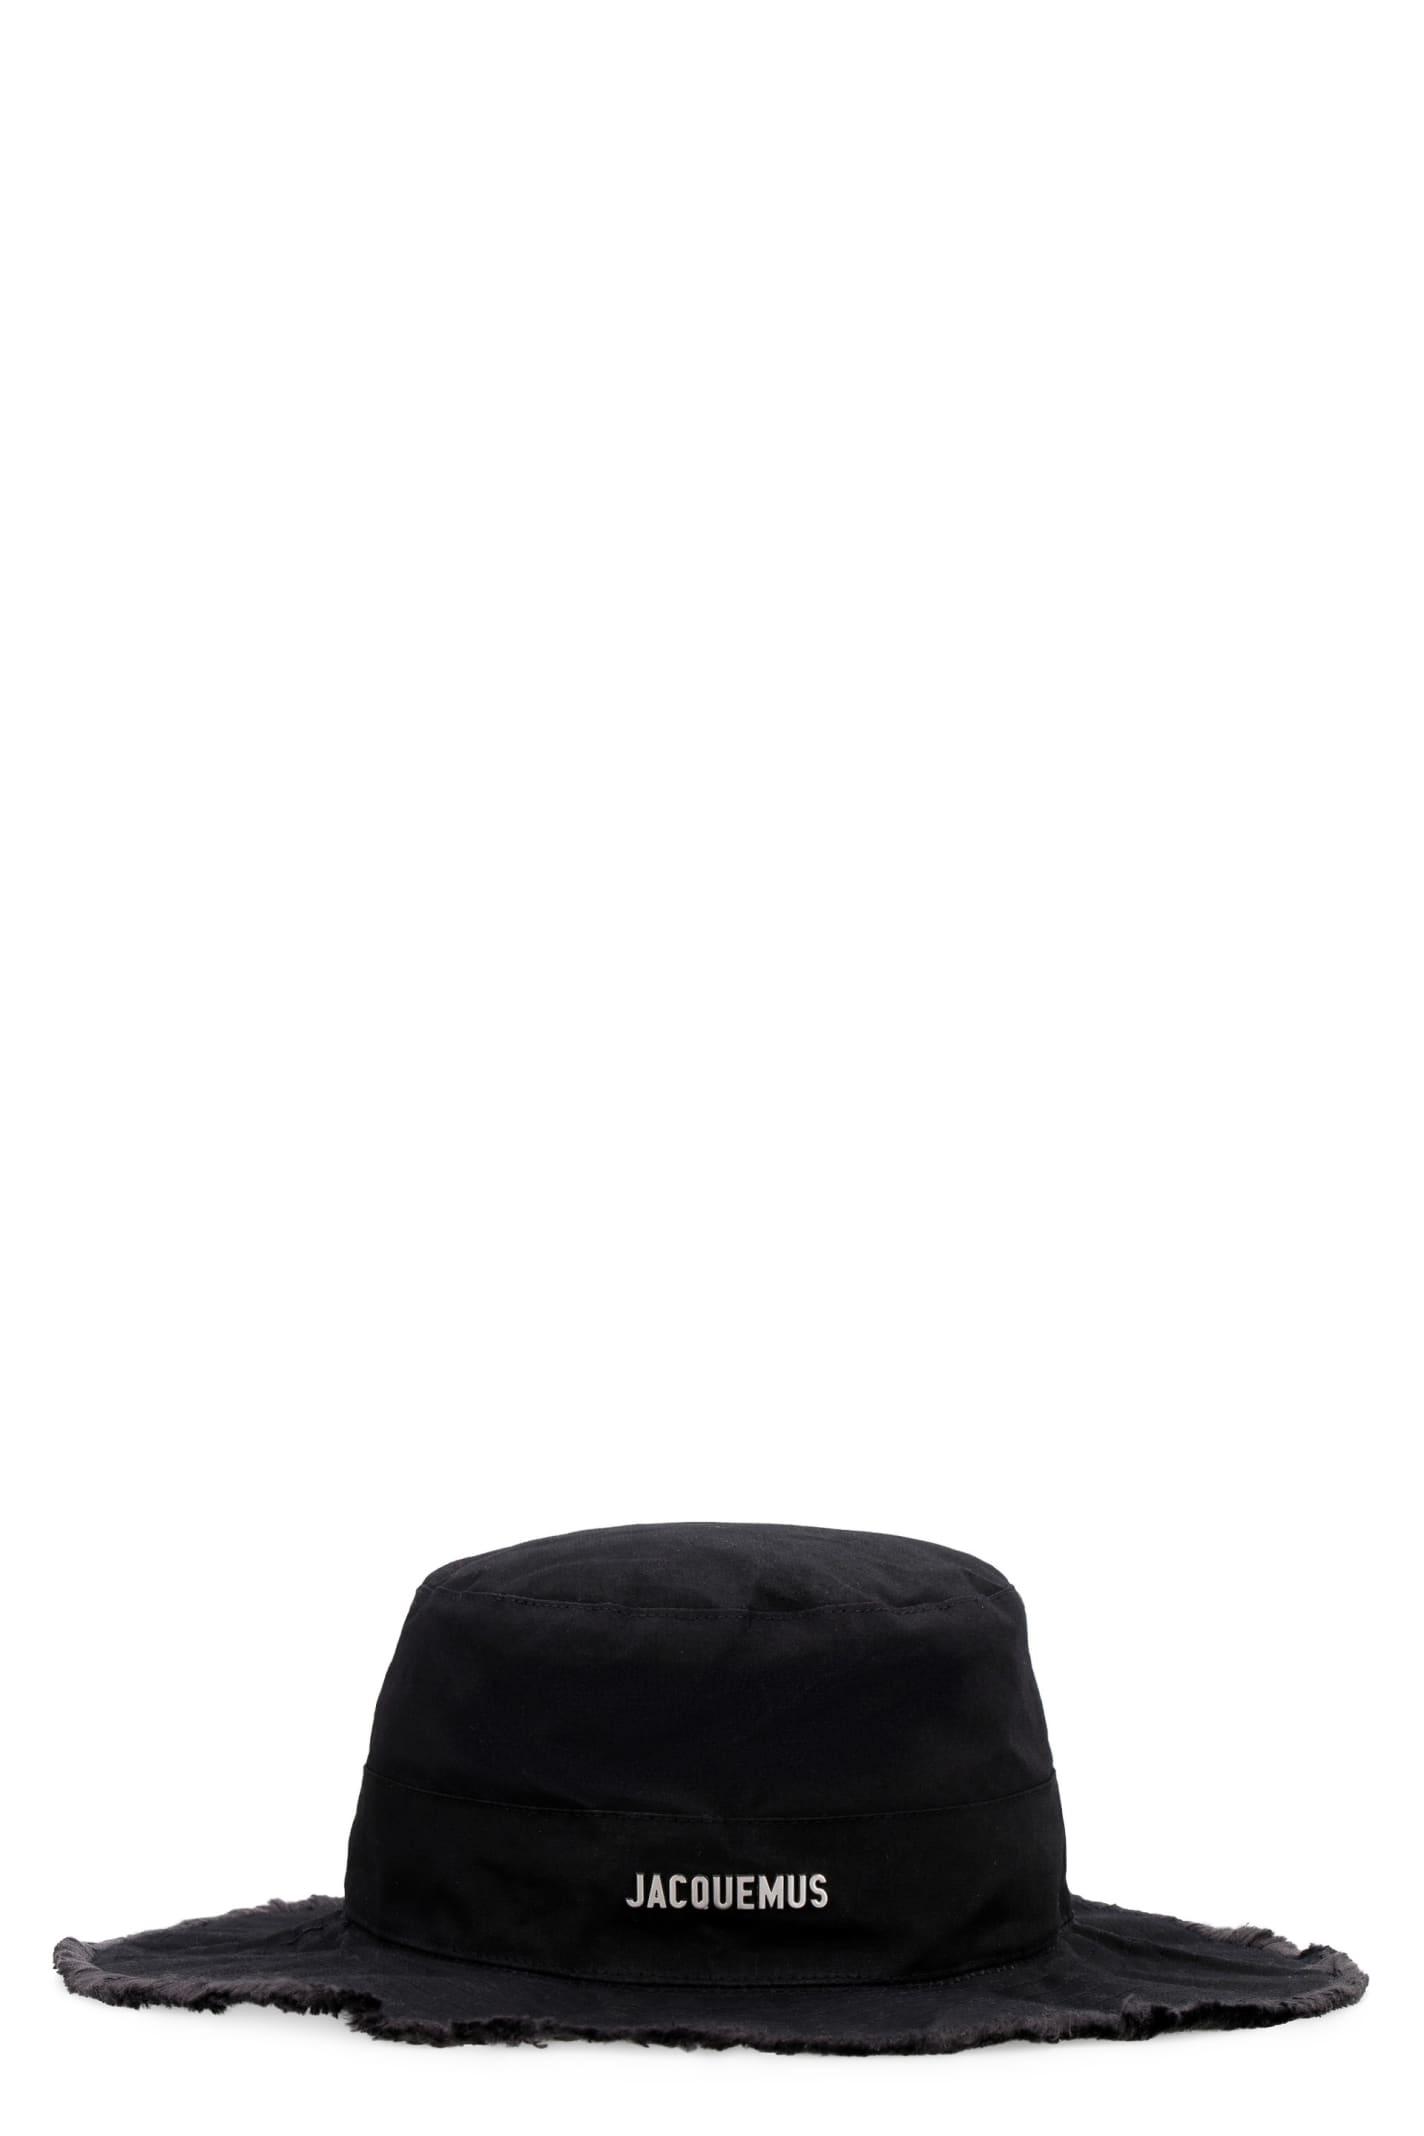 Jacquemus COTTON HAT